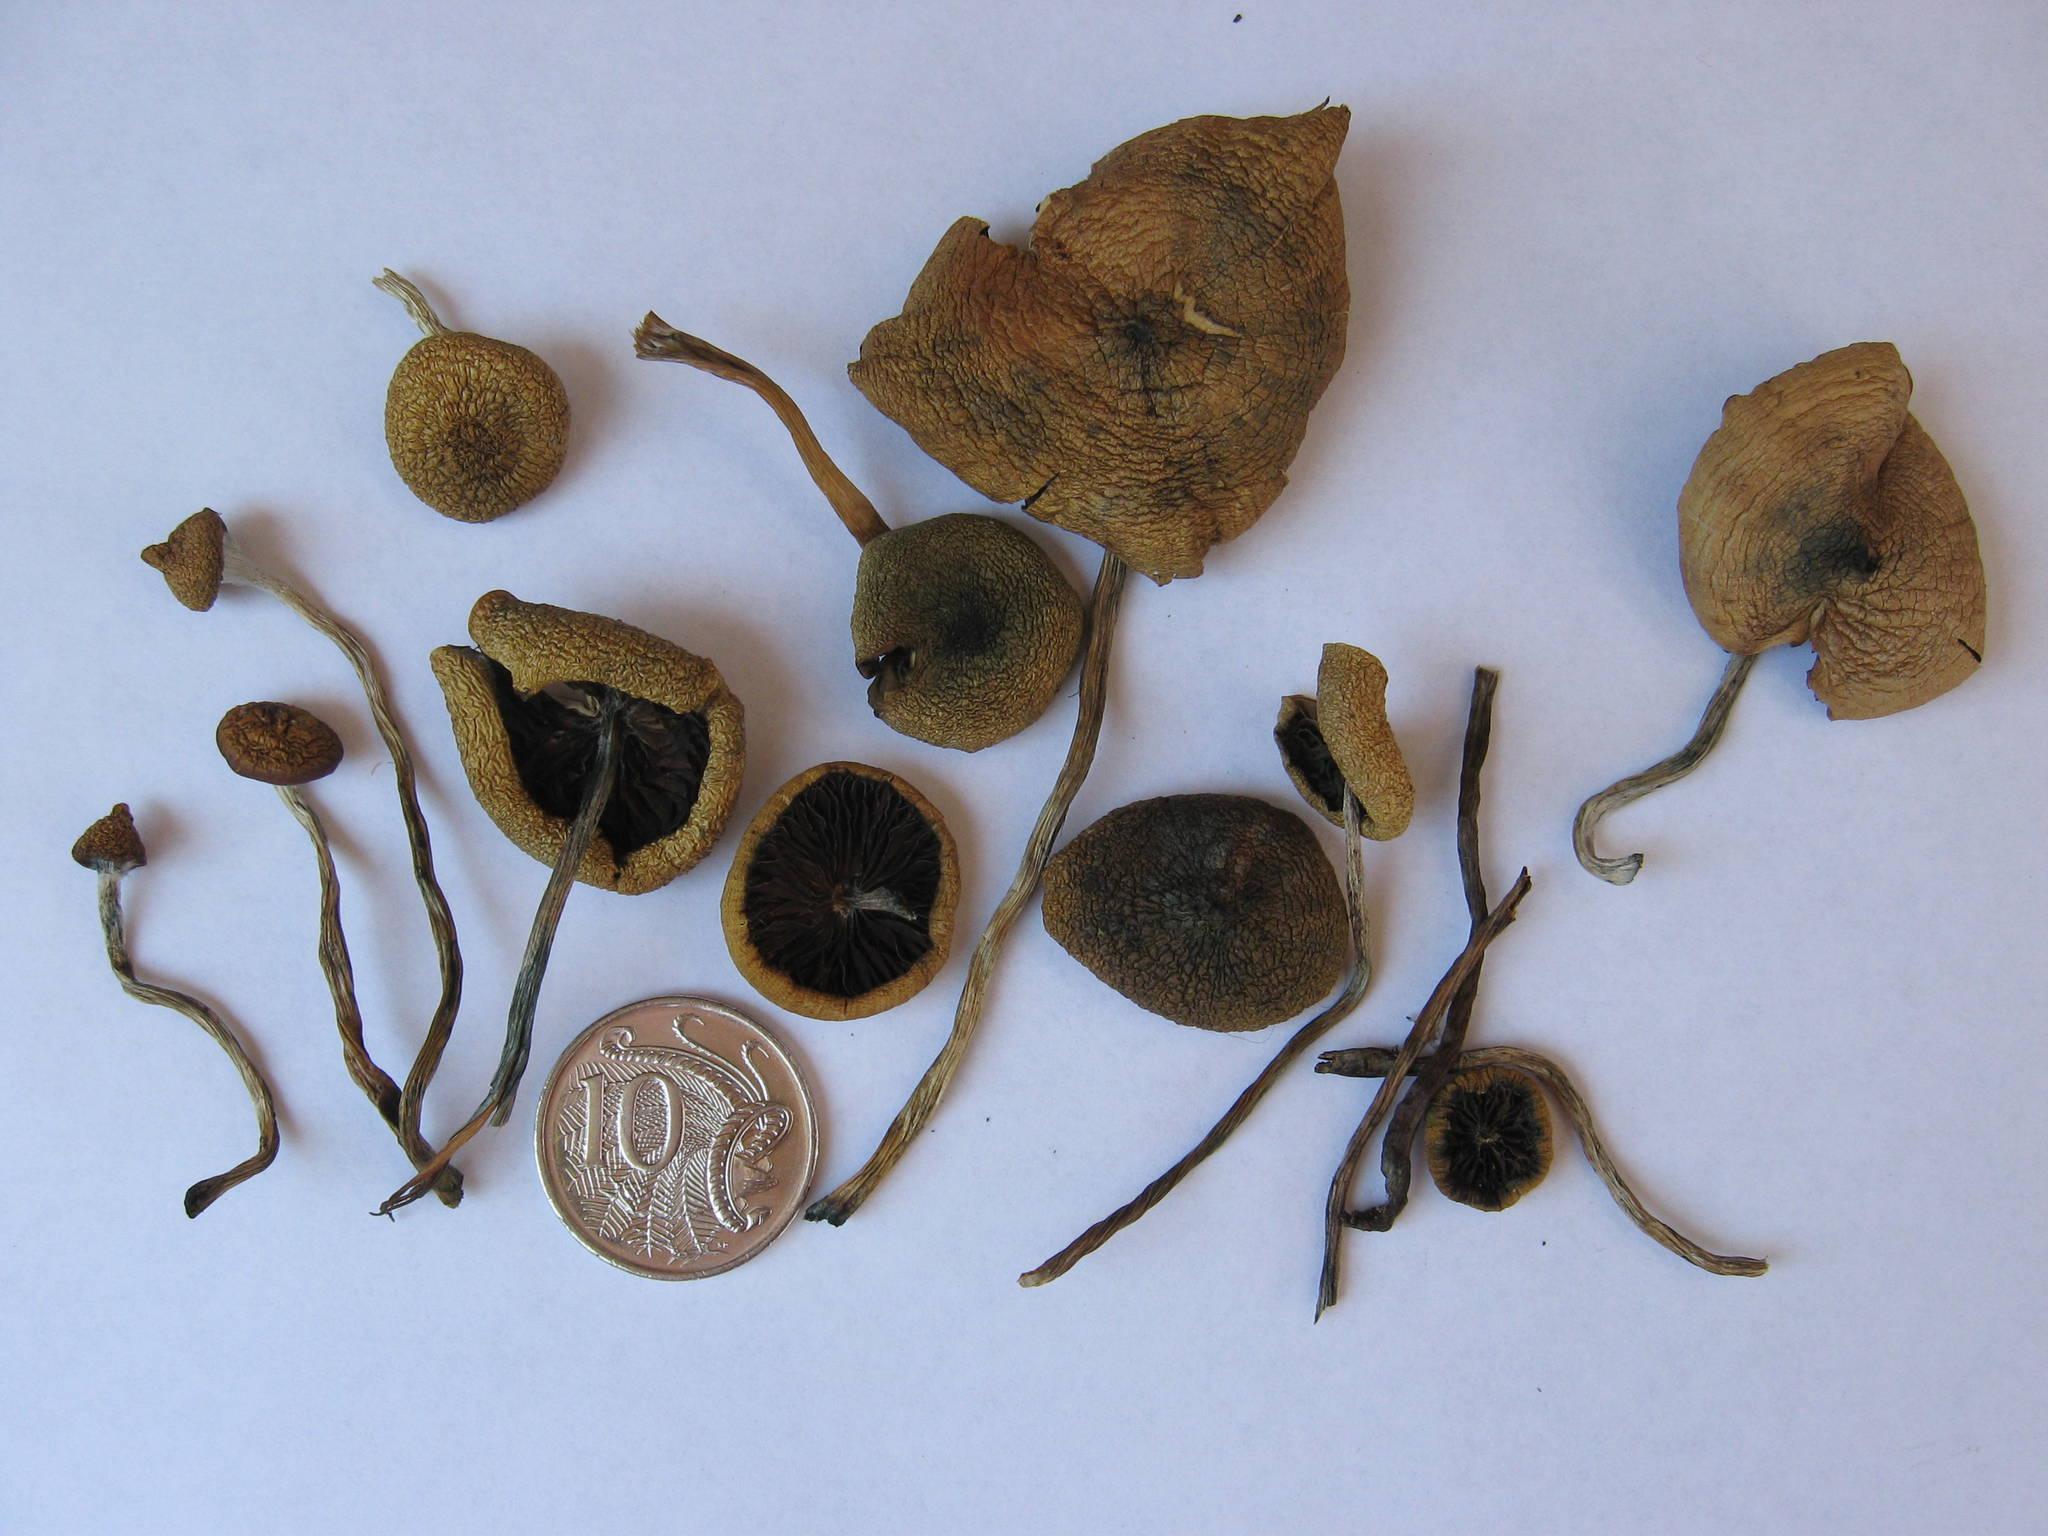 Dried psilocybe subaeruginosa from 2 different locations